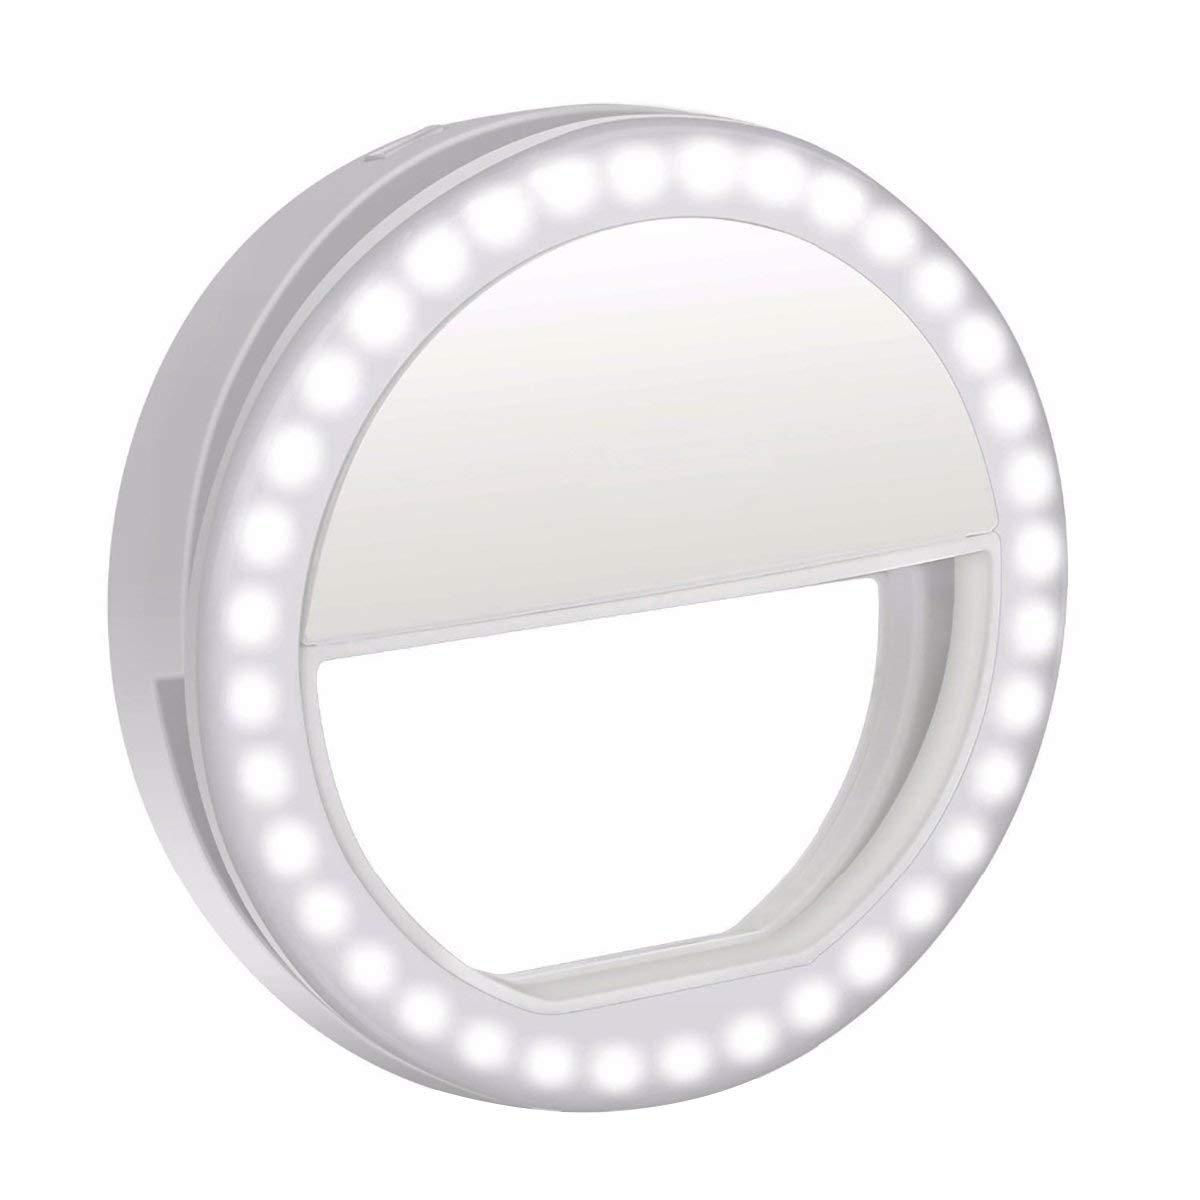 ZealBea Focus Clip on Selfie Ring Light Portable Selfie Lamp, Selfie LED Camera Lamp[36 LED] for Smartphone iPhone Samsung Galaxy(White)